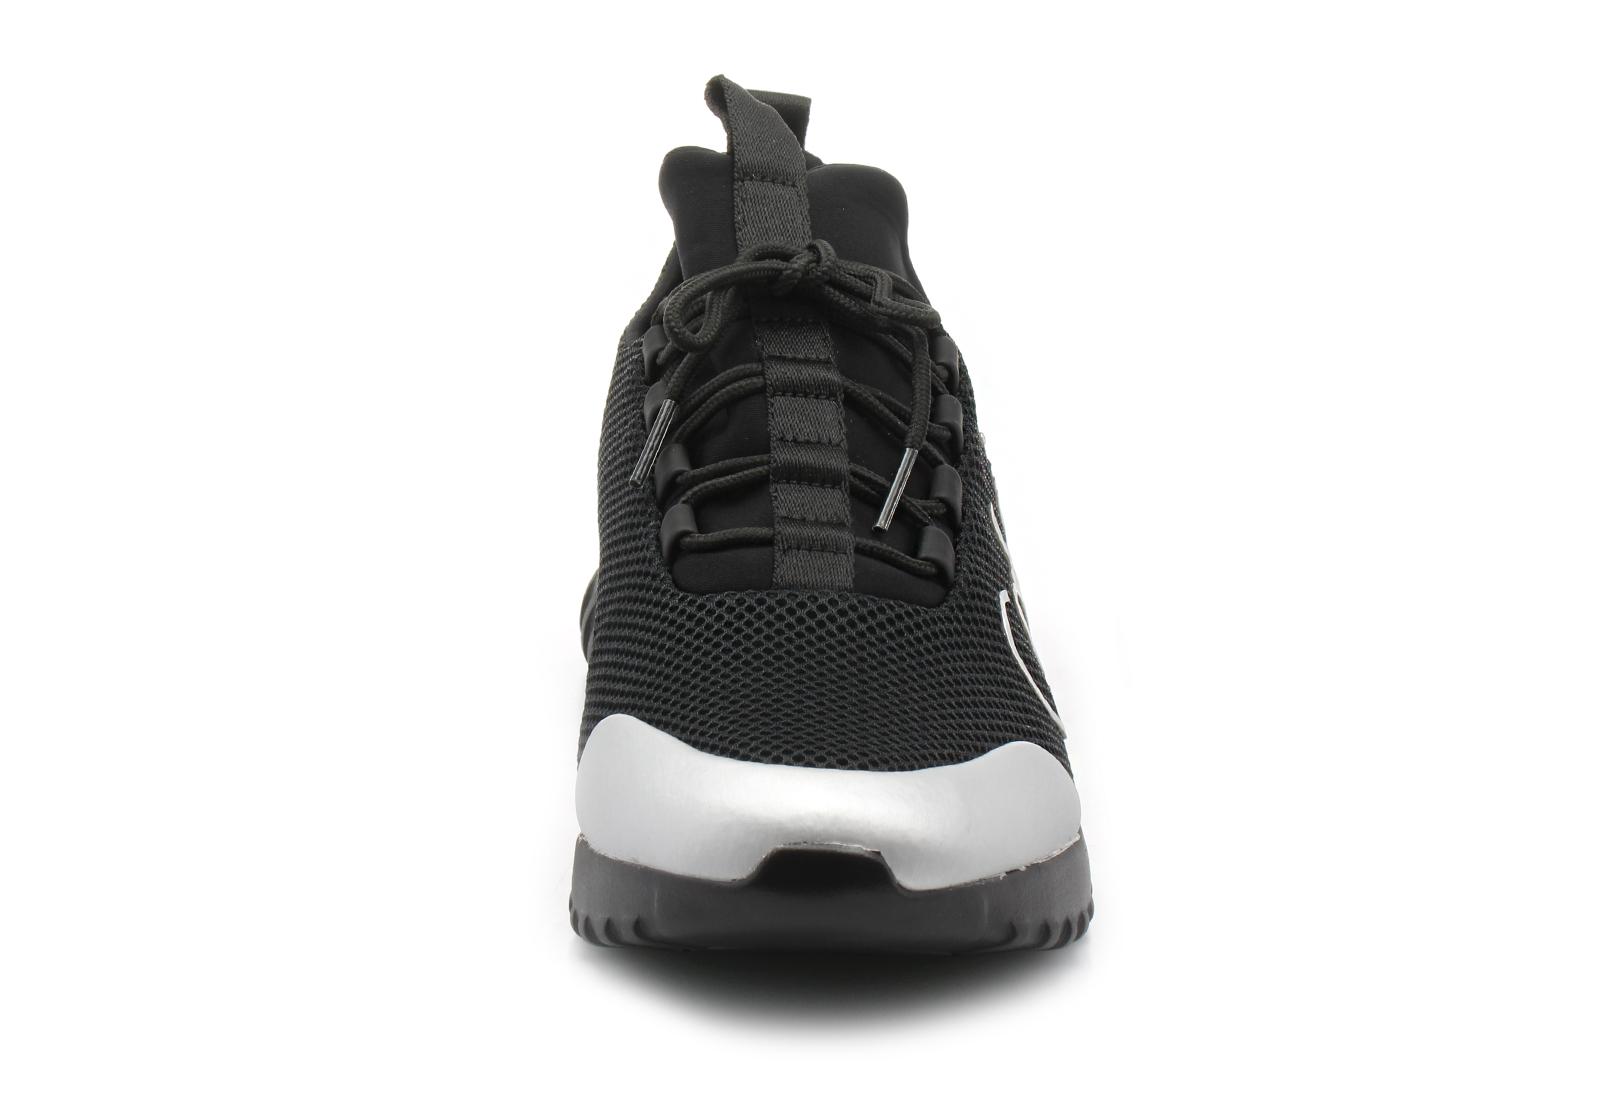 Calvin Klein Jeans Cipő - Ron - S0506-BKS - Office Shoes Magyarország 0b0988d7d1